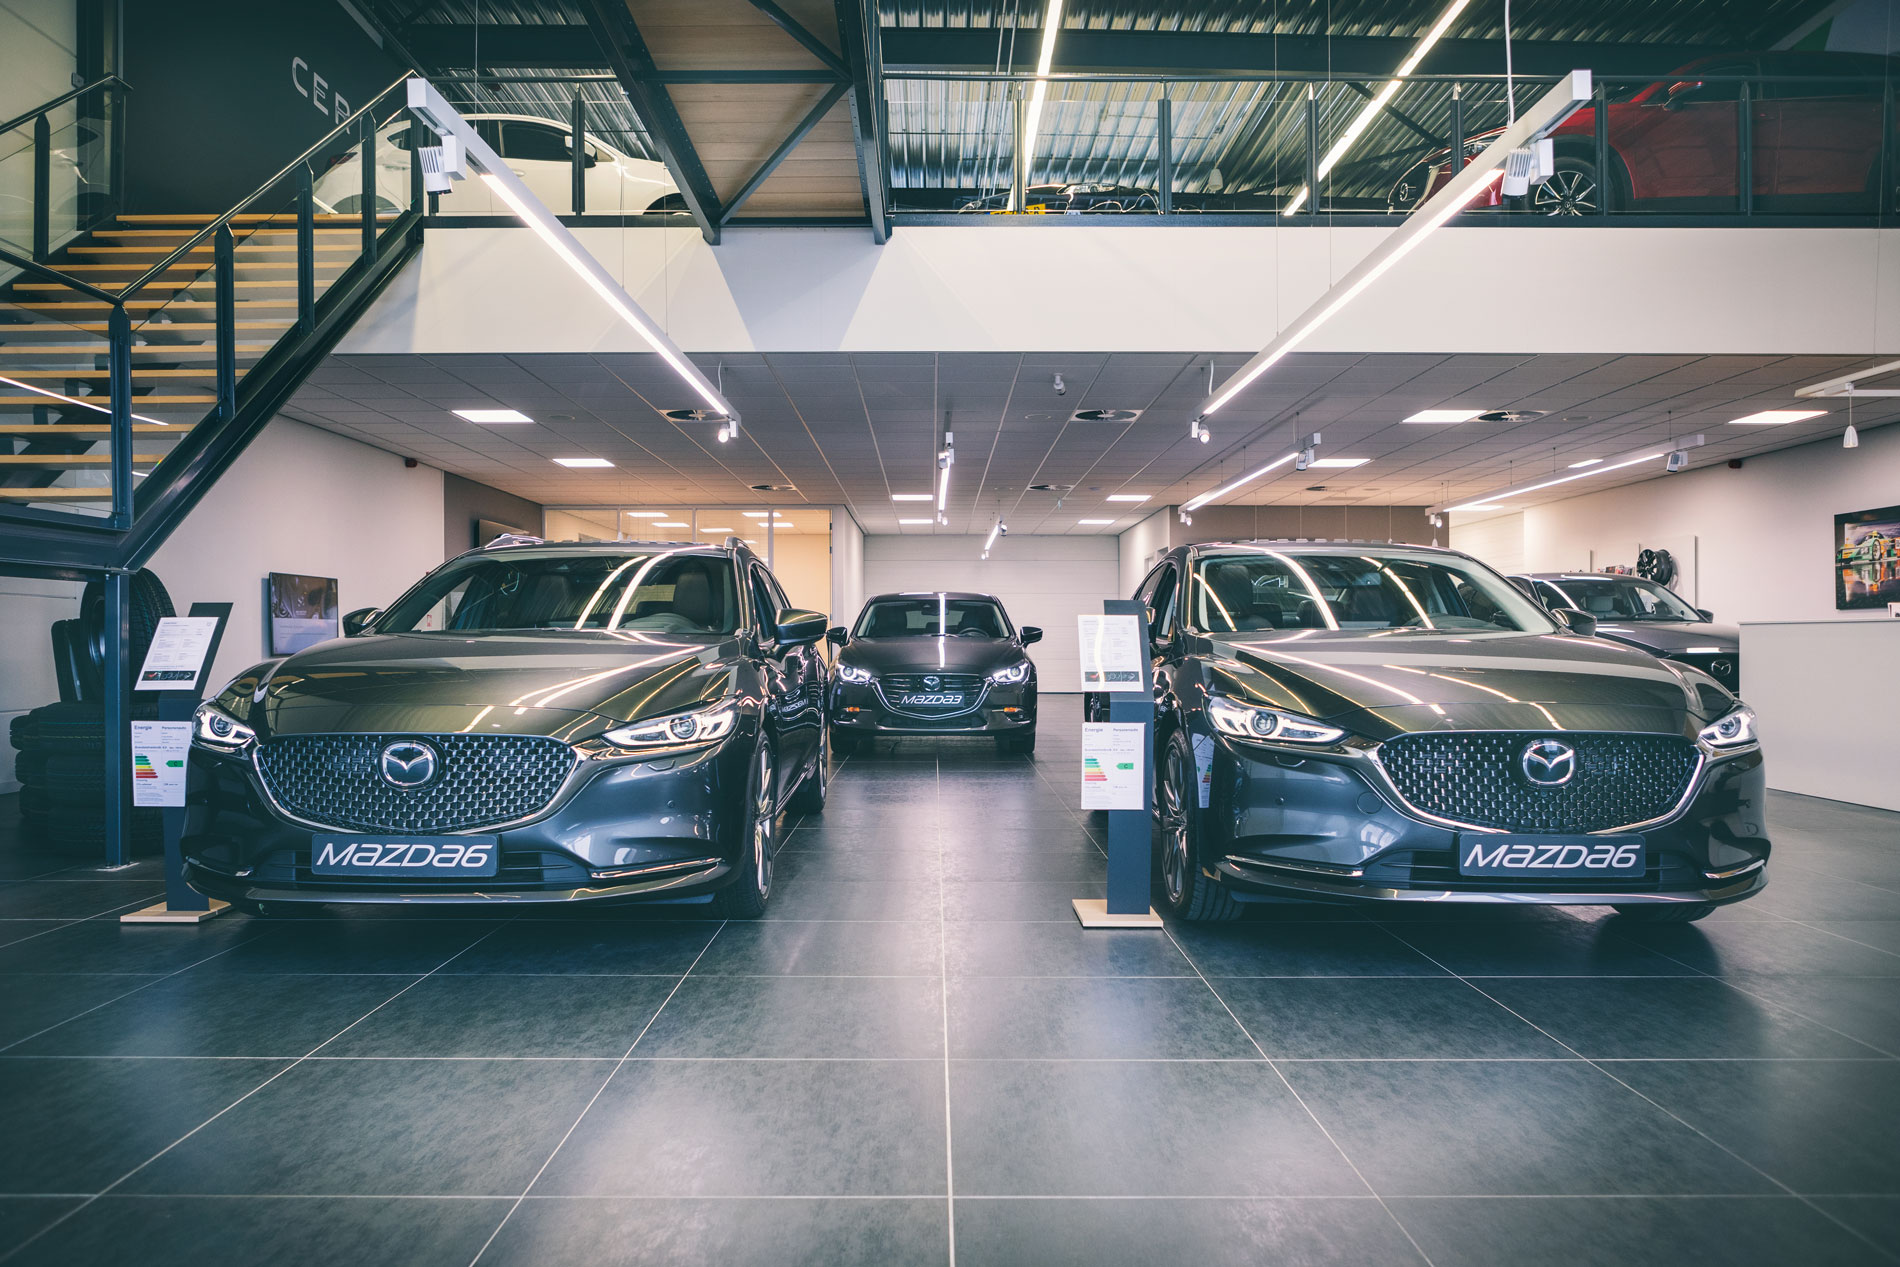 Mulder-Mazda weer open op afspraak